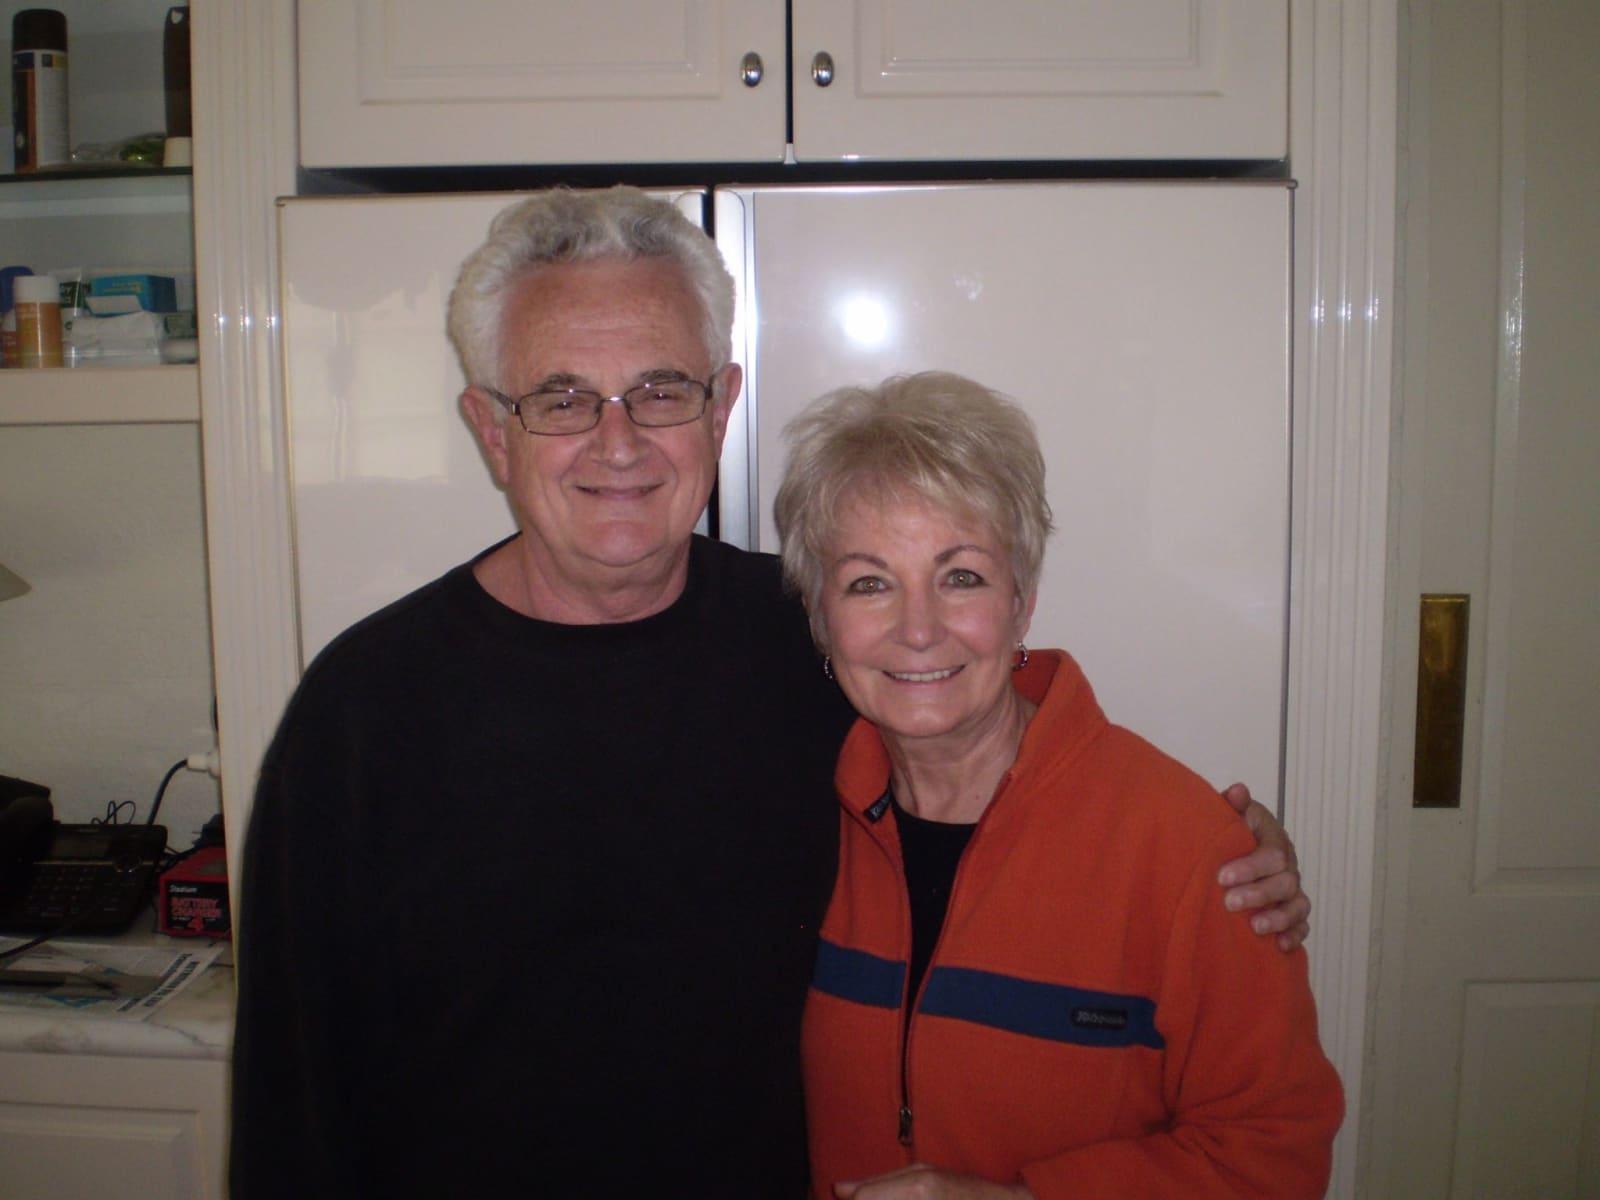 Bernadette & Enzo from Gisborne, Victoria, Australia